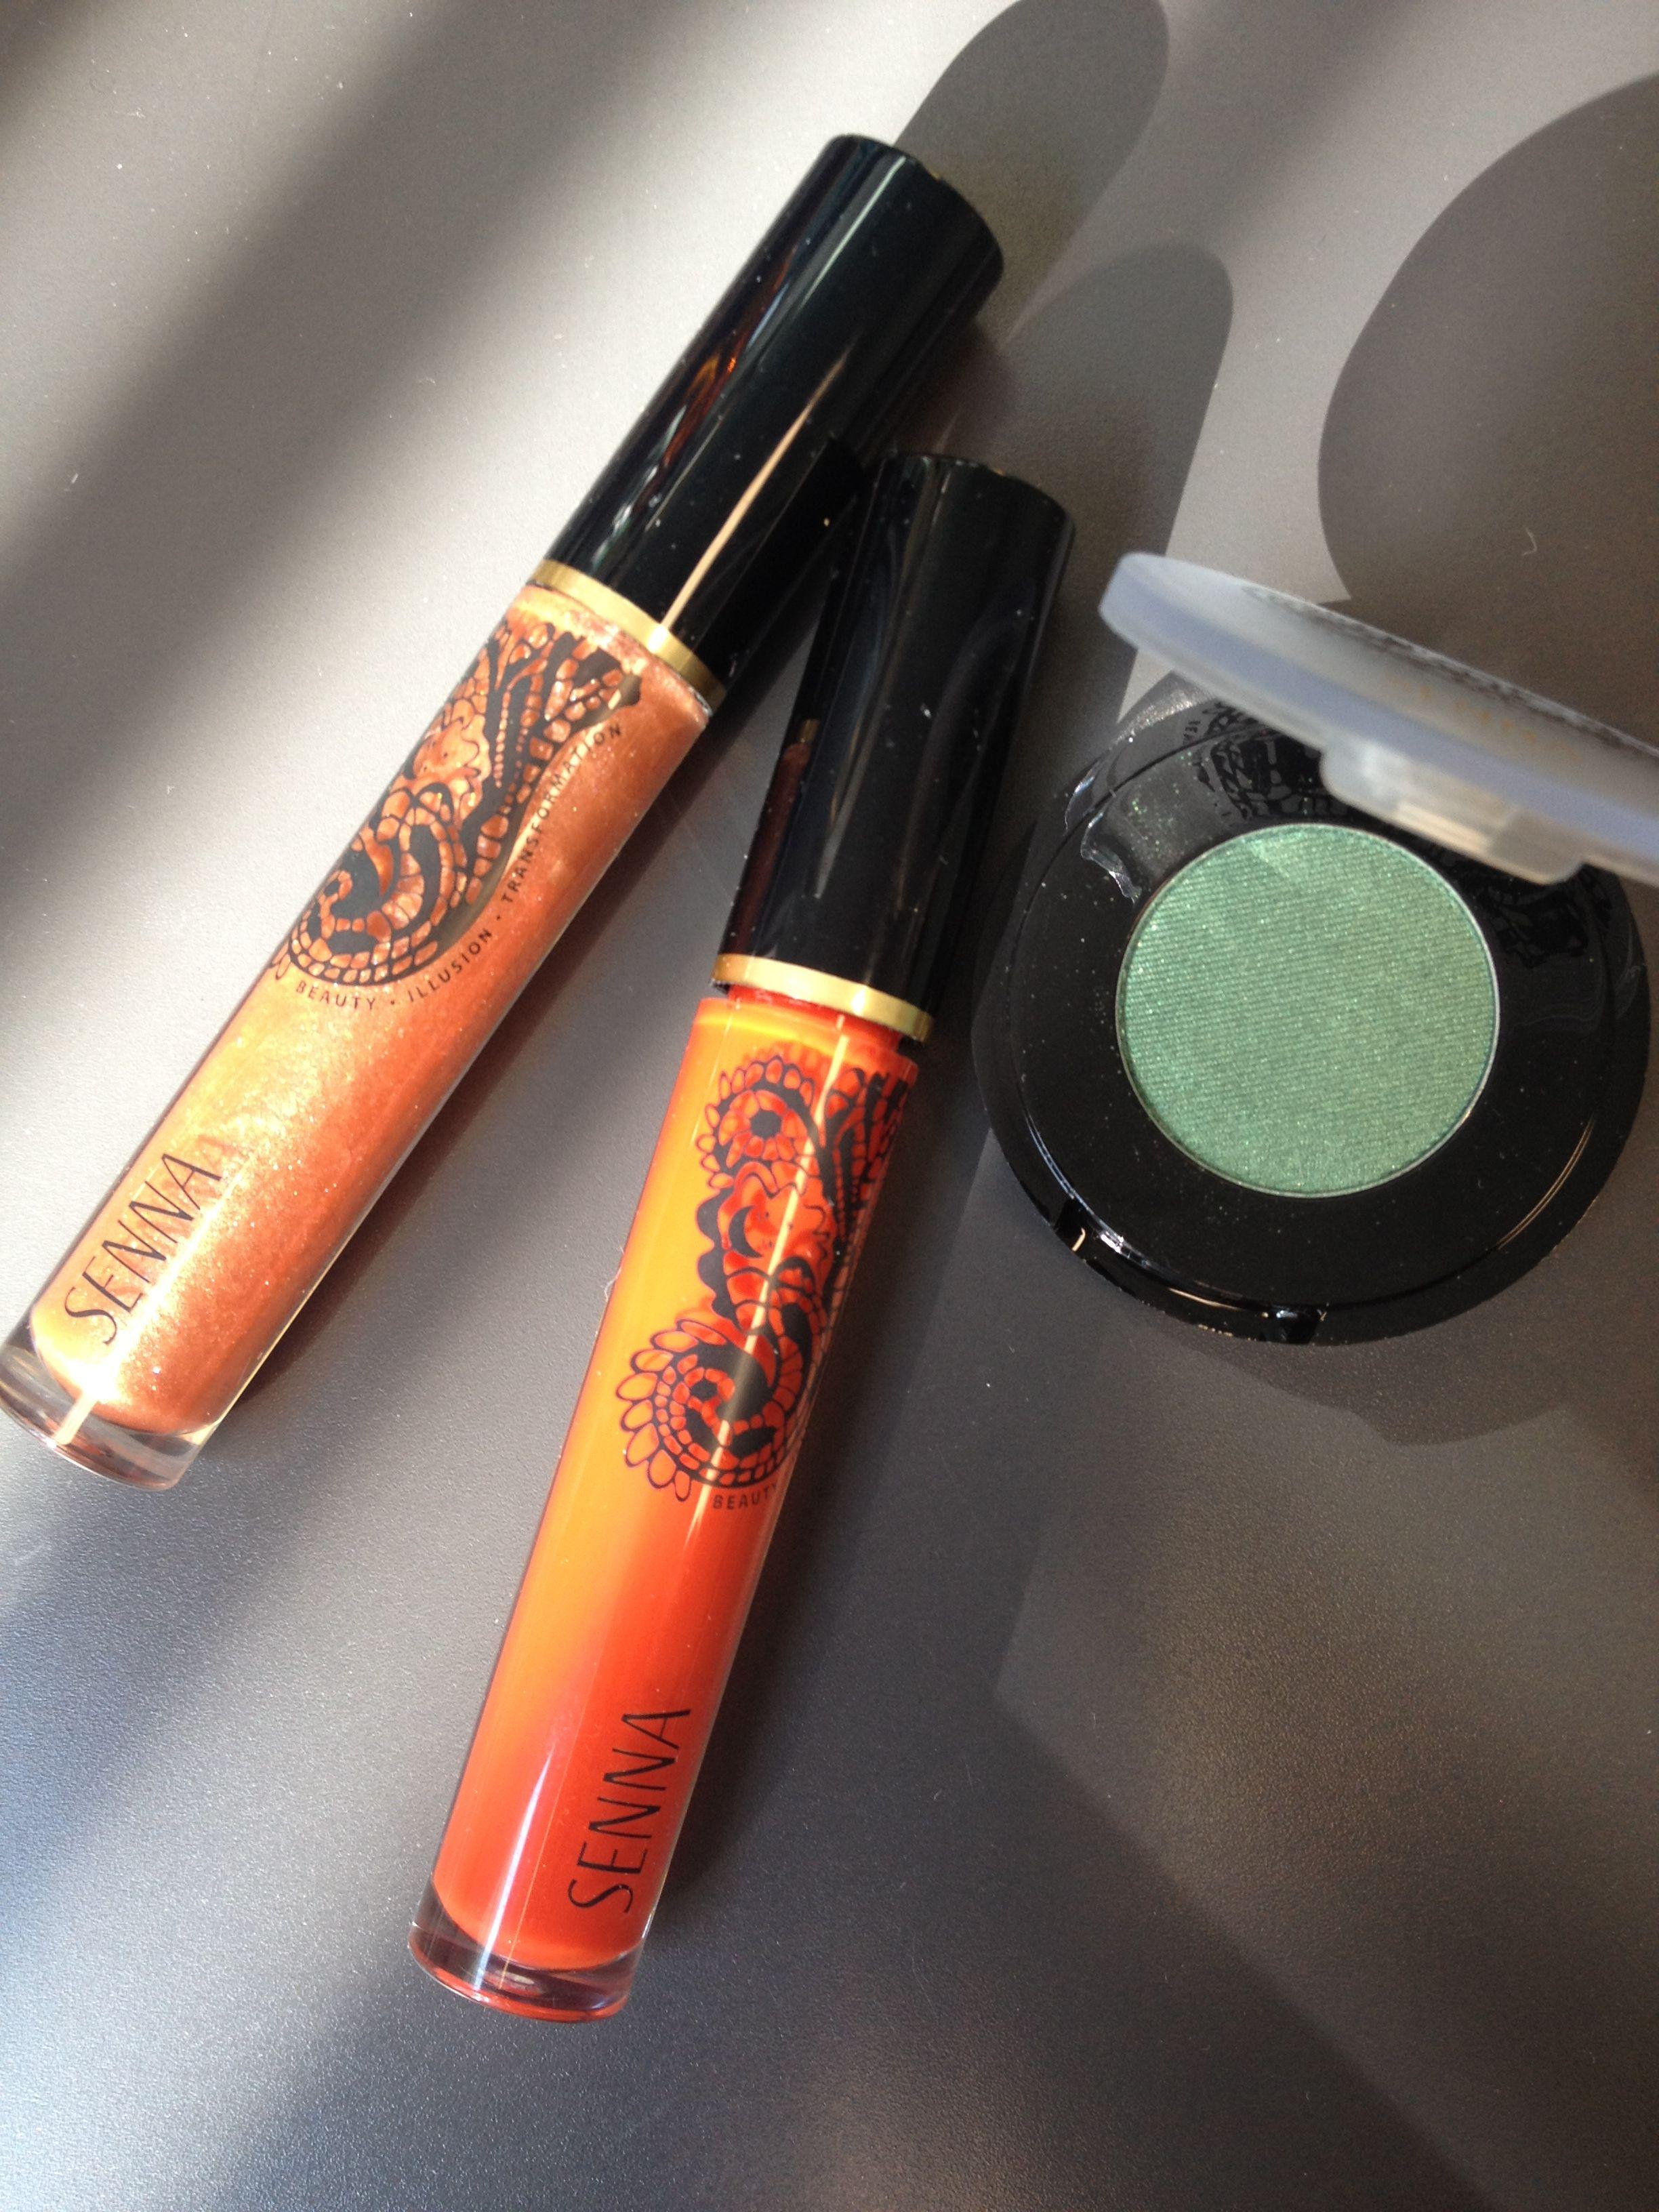 Emerald Eye Color & Bonfire Lip Lacquer